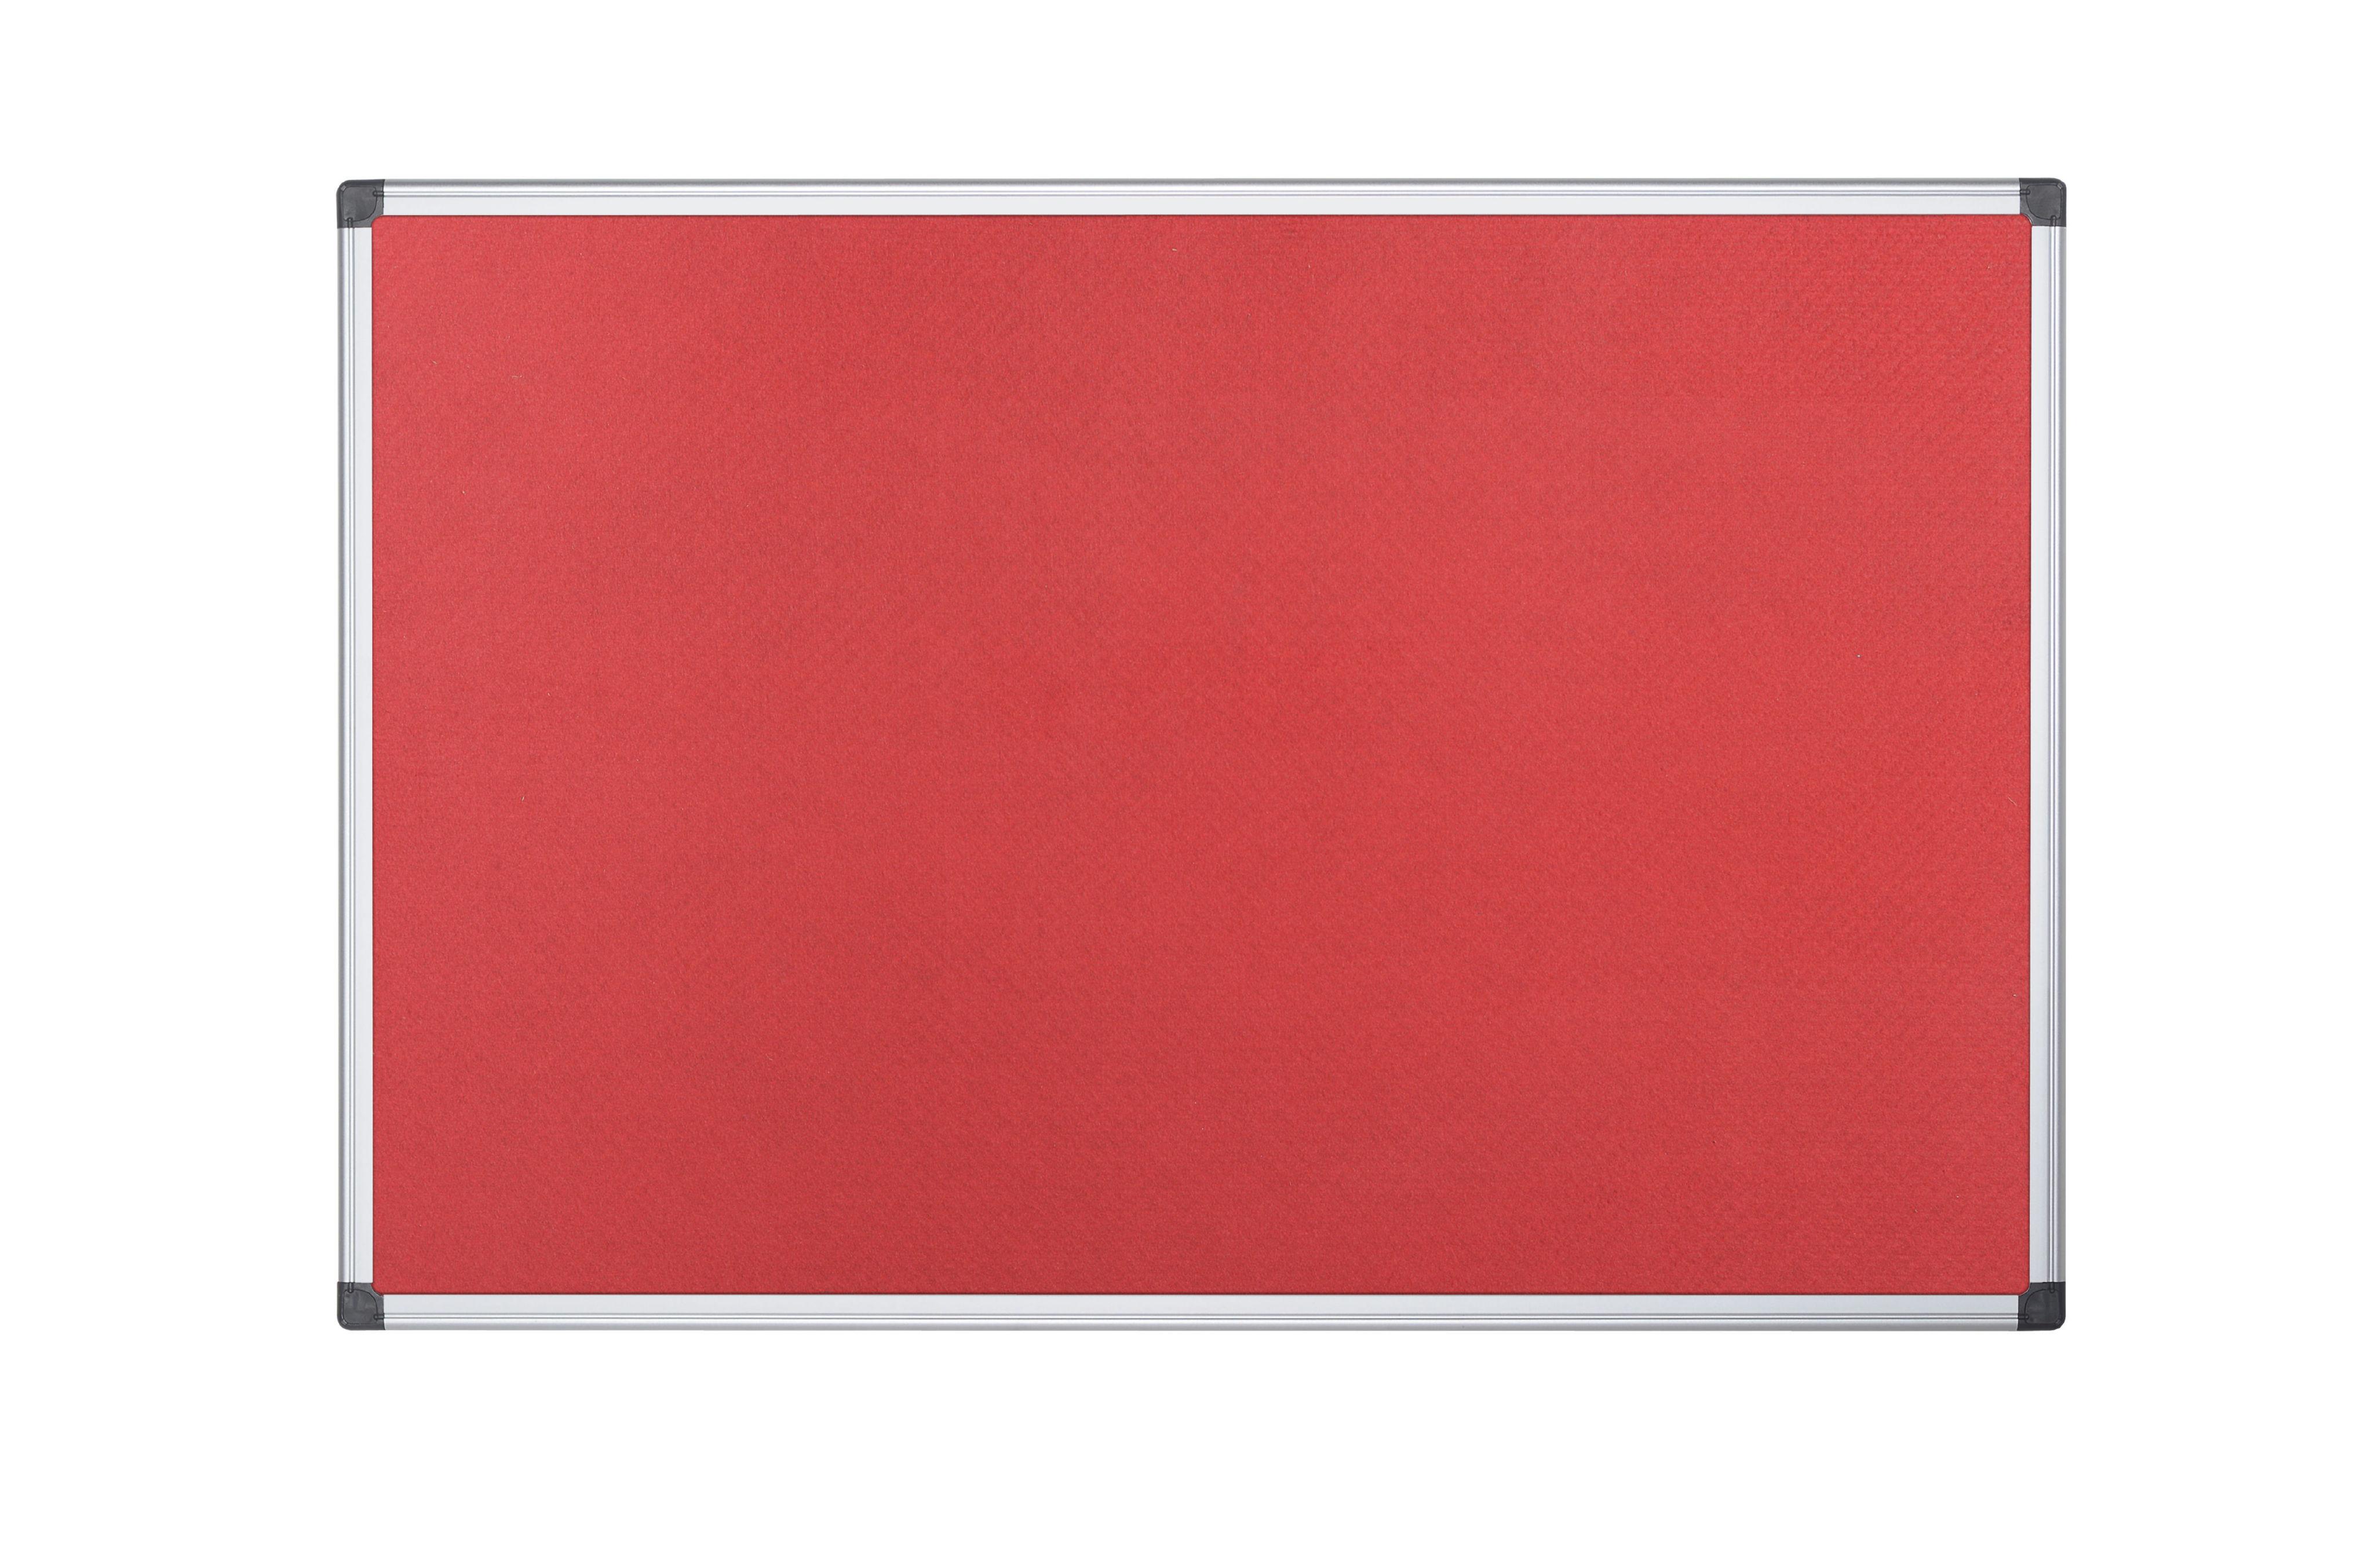 Felt Bi-Office Maya Red Felt Noticeboard Aluminium Frame 1200x1200mm